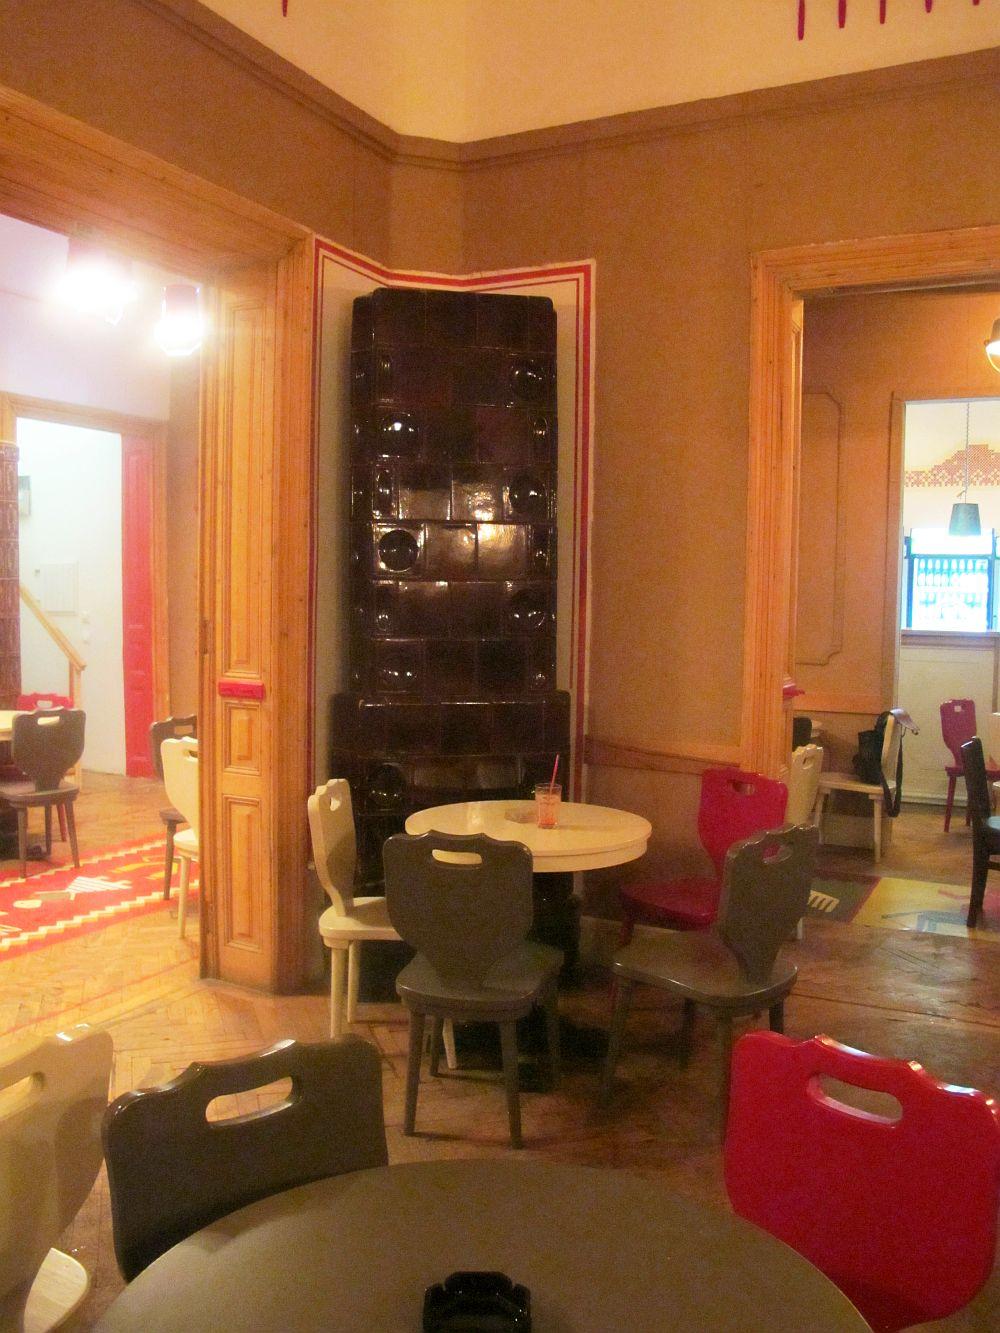 adelaparvu.com despre La Copac, design Interior Mihai Grama (26)